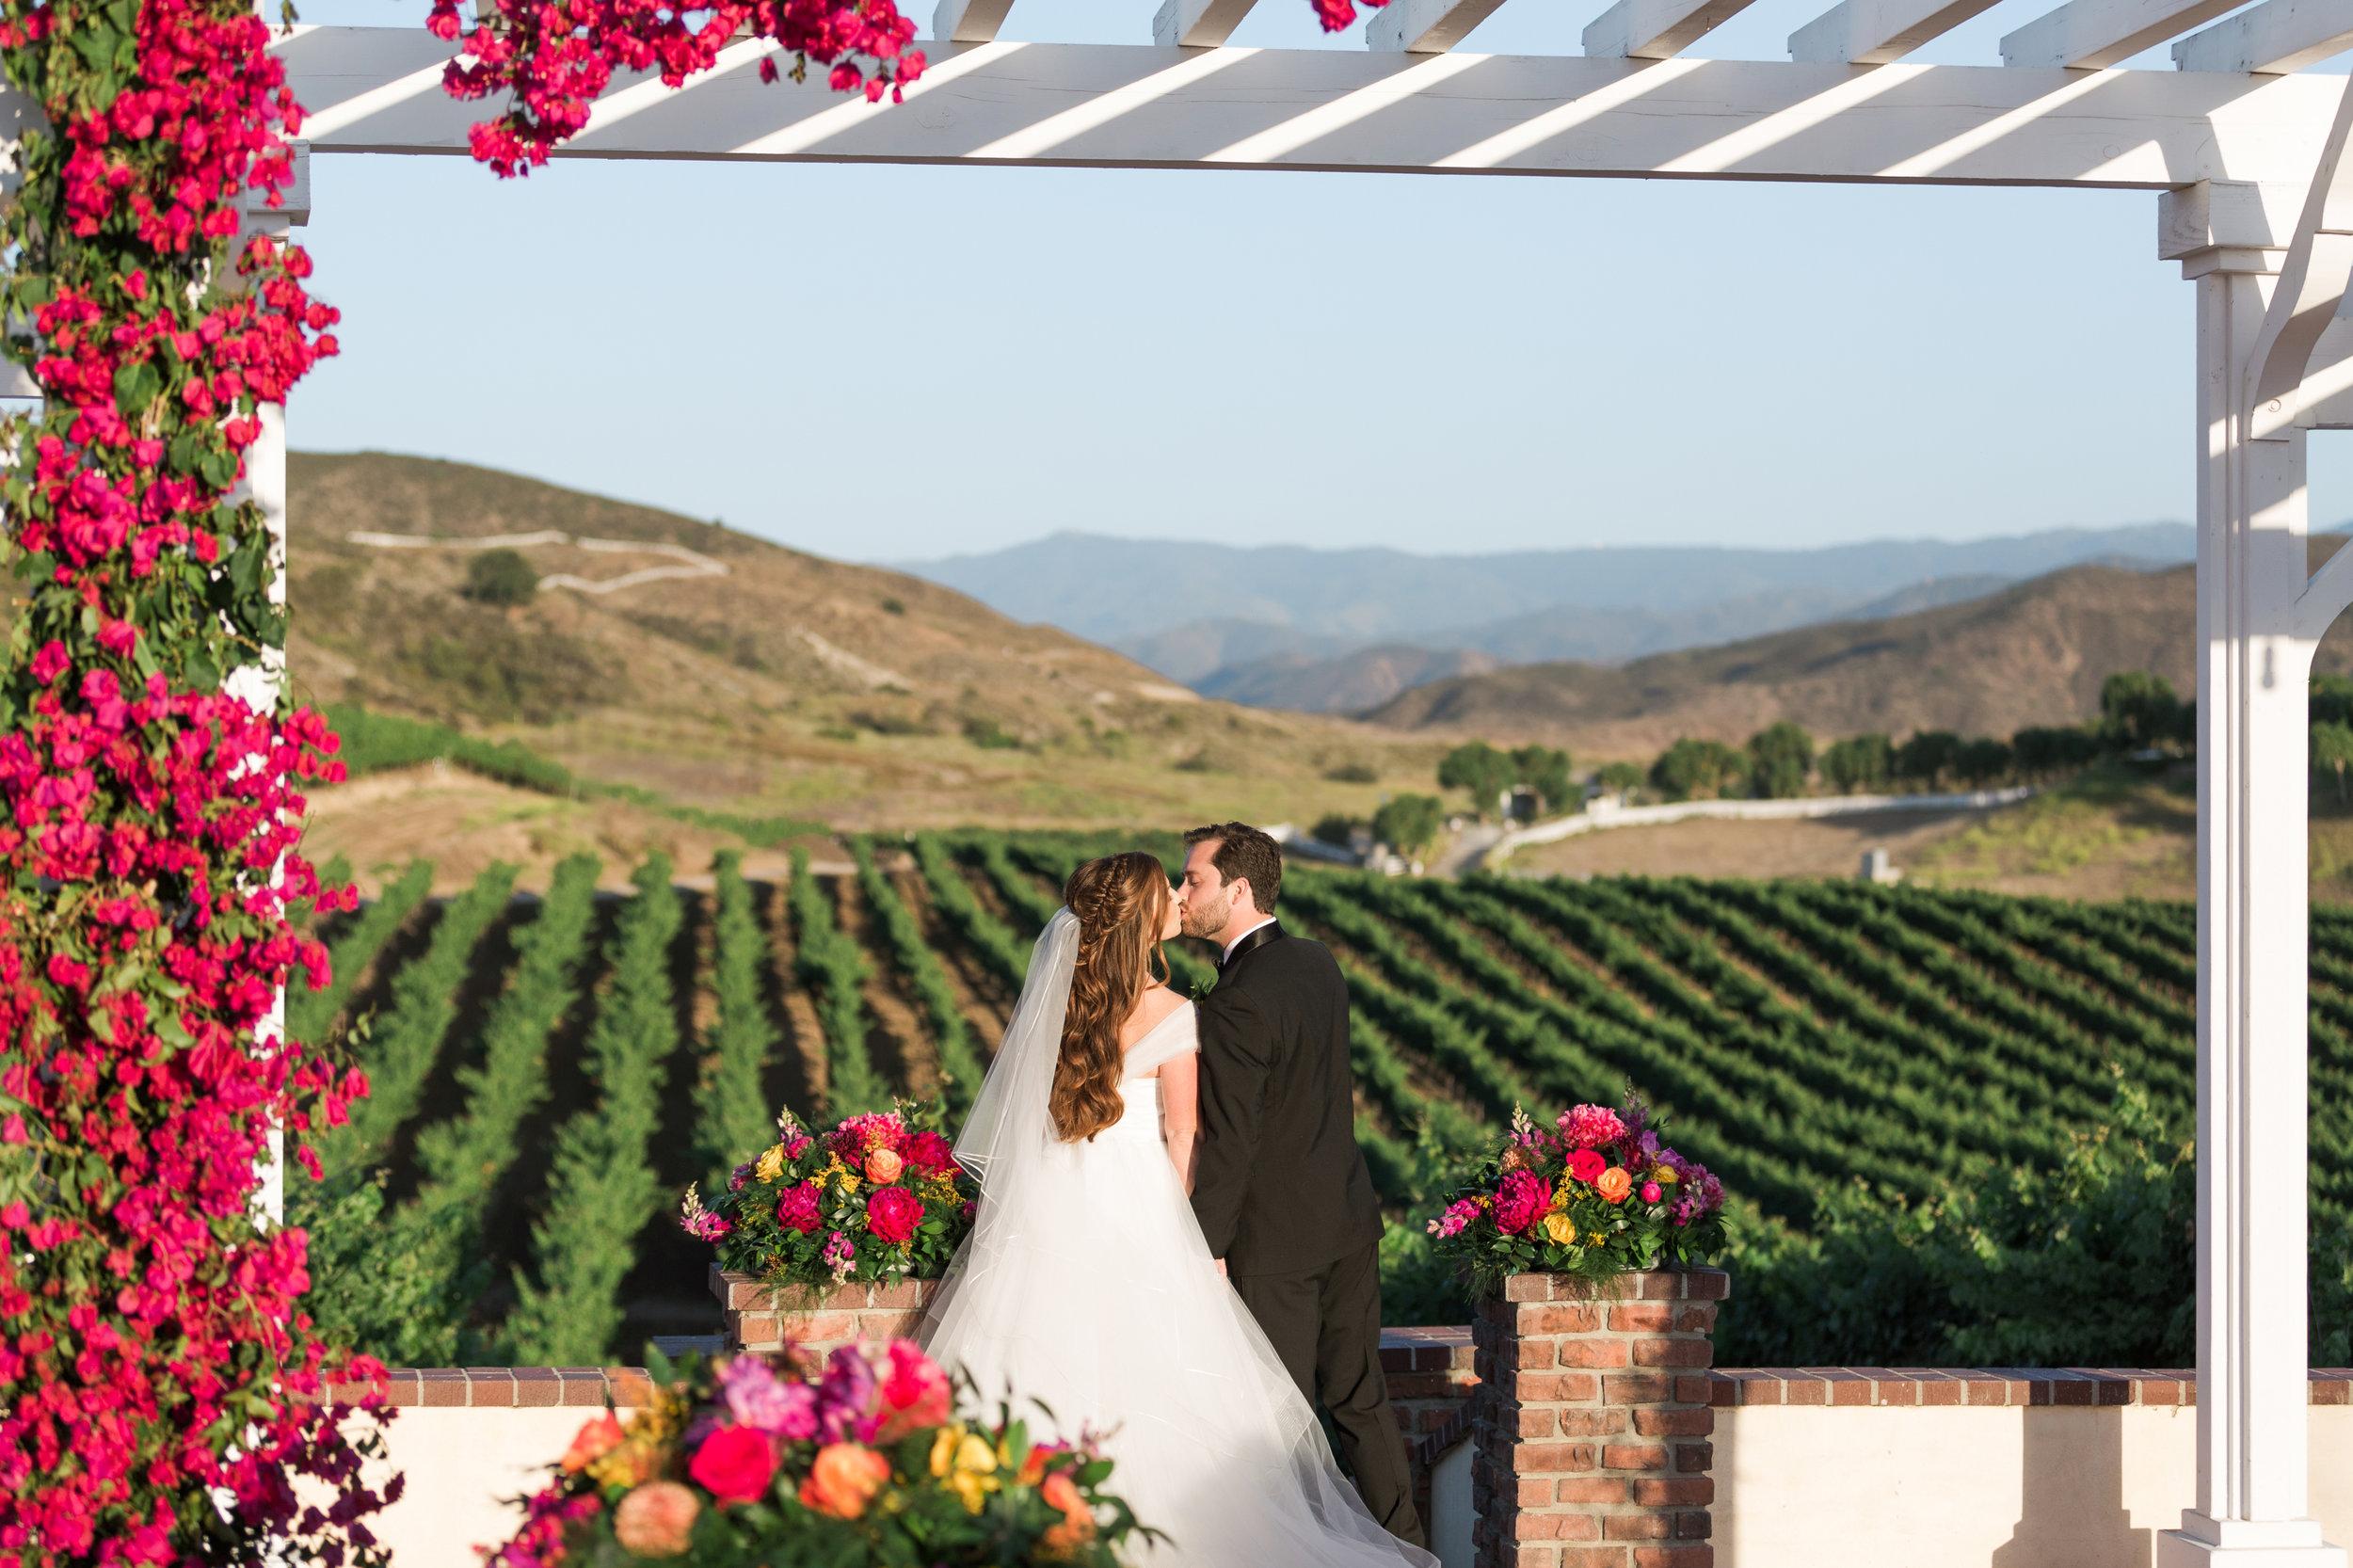 Leoness Cellars Winery Wedding Photographer Leah Vis  (4).jpg